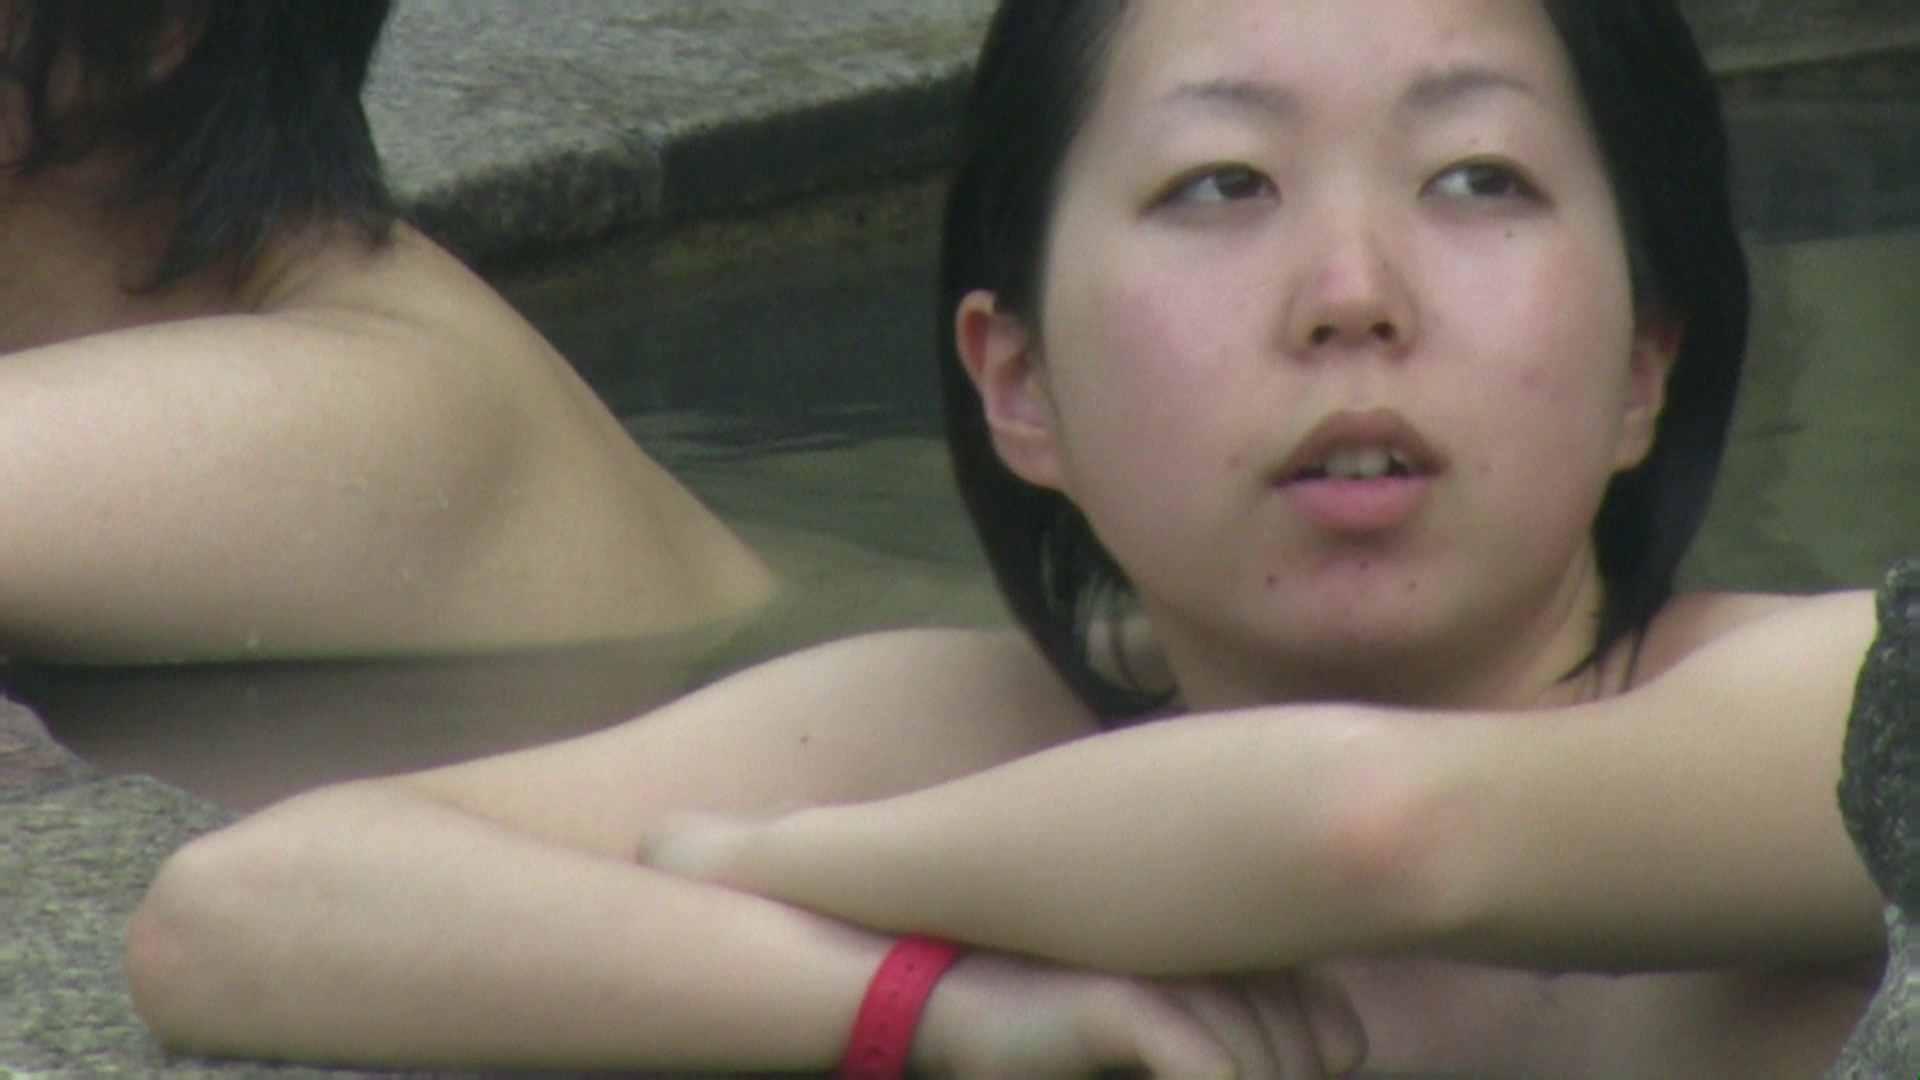 Aquaな露天風呂Vol.06【VIP】 HなOL | 盗撮  86pic 23